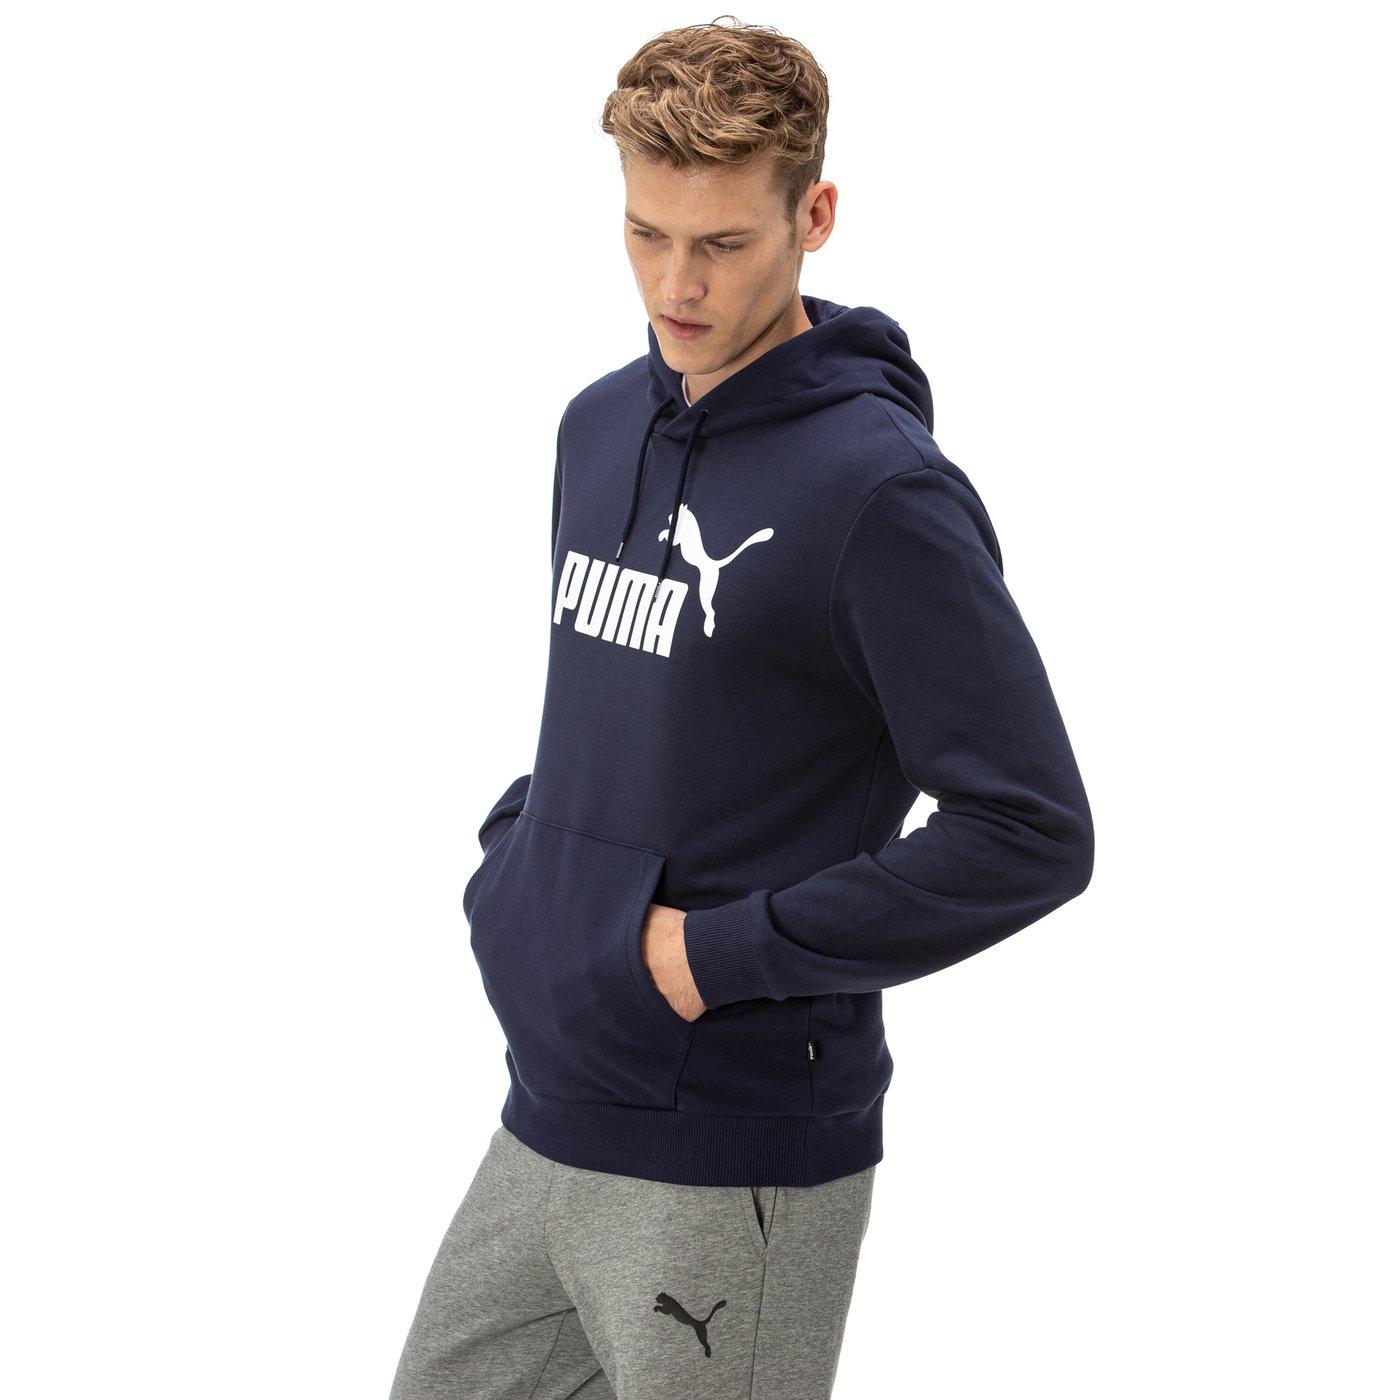 Puma Ess Hoody Tr Big Logo Erkek Lacivert Sweatshirt